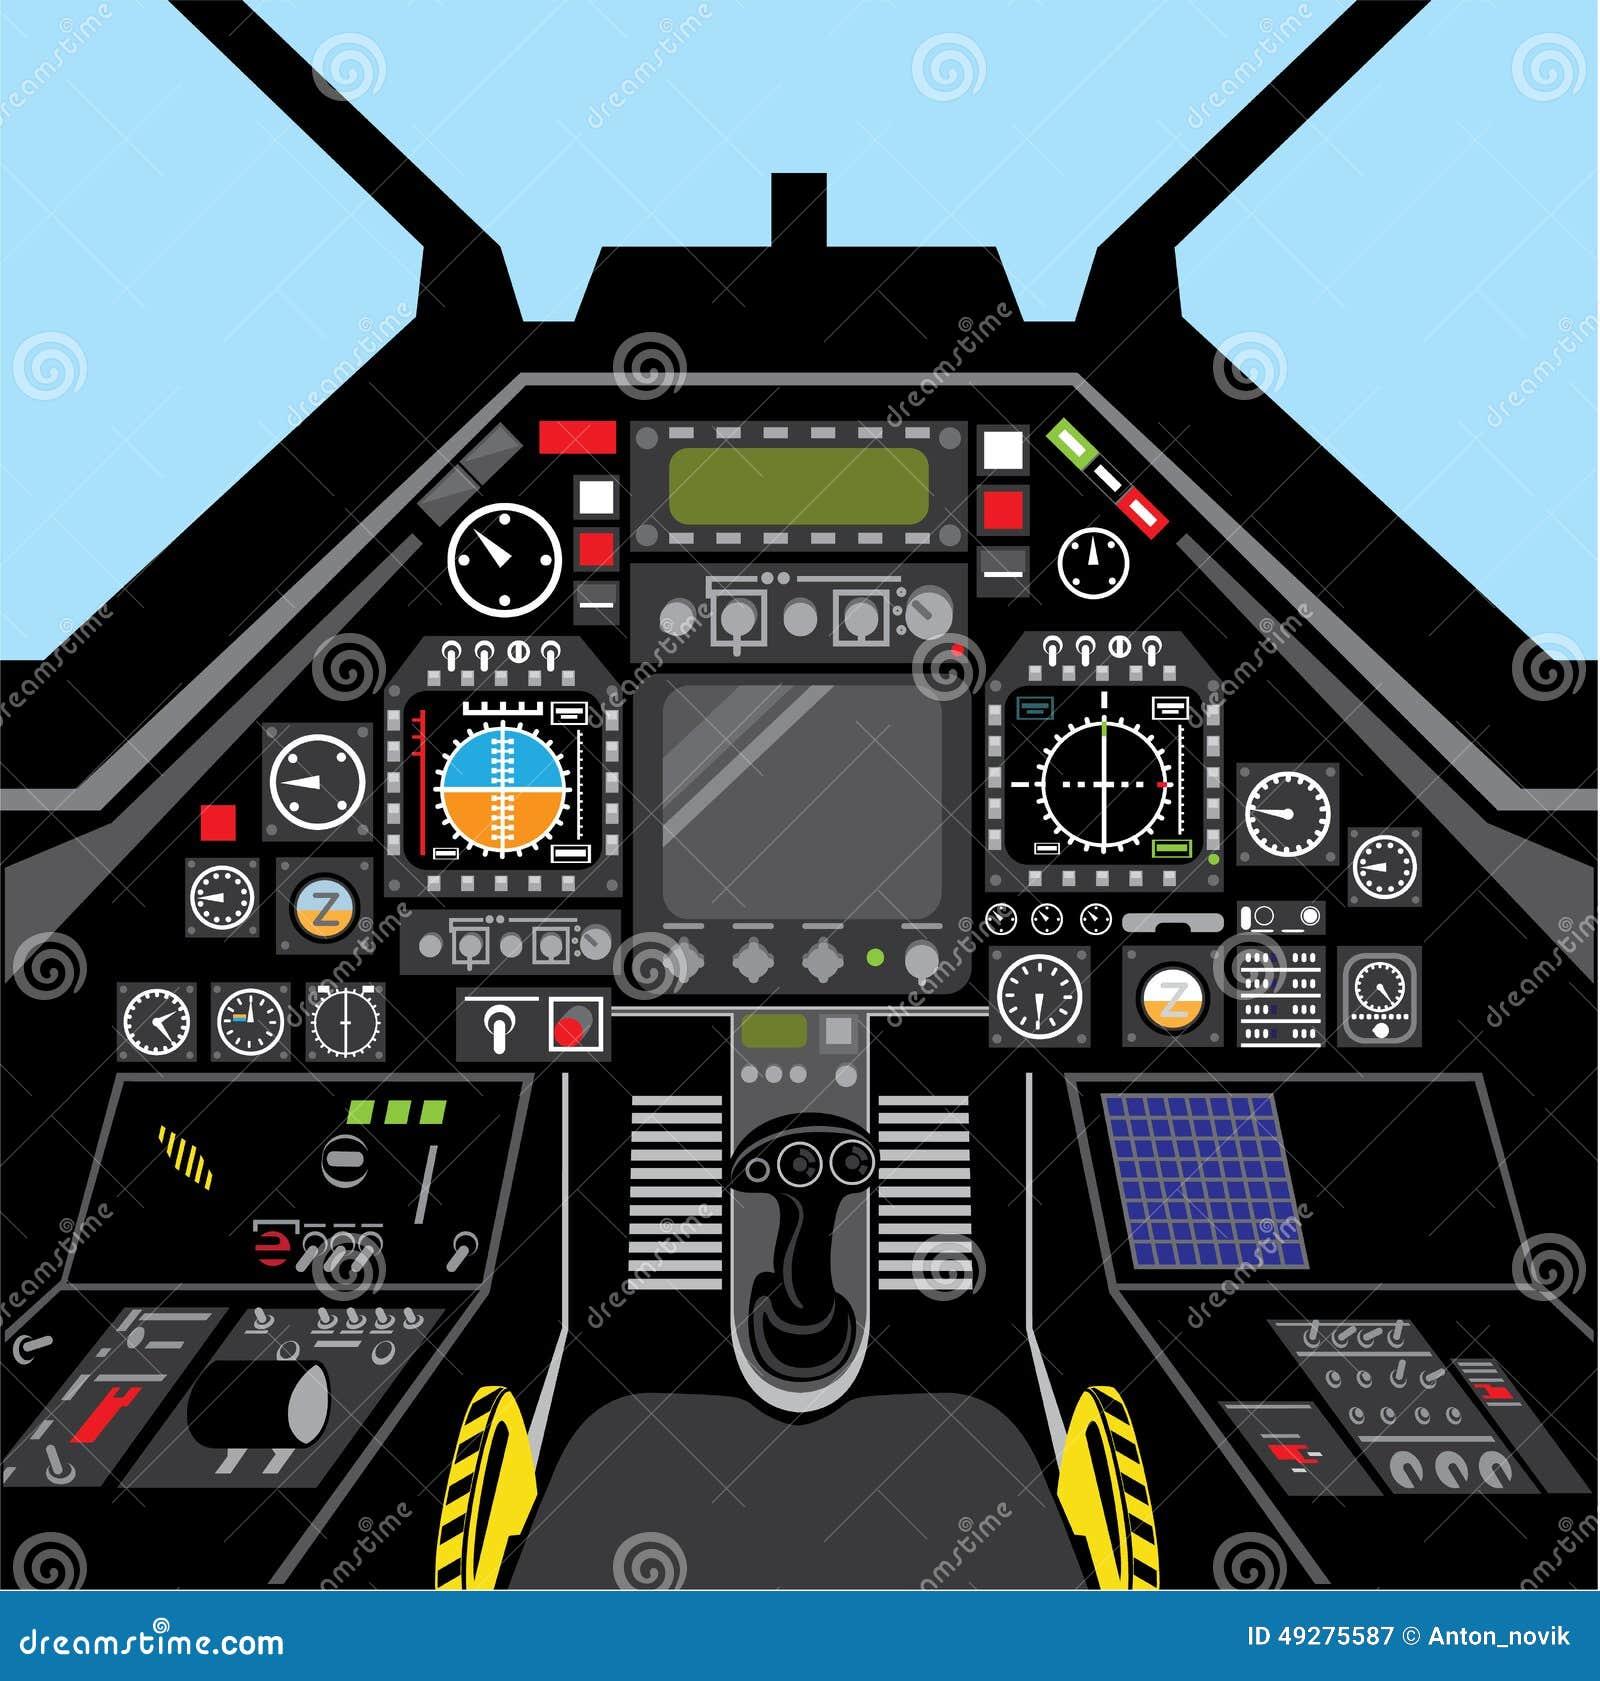 Fighter Jet Cockpit Stock Vector - Image: 49275587